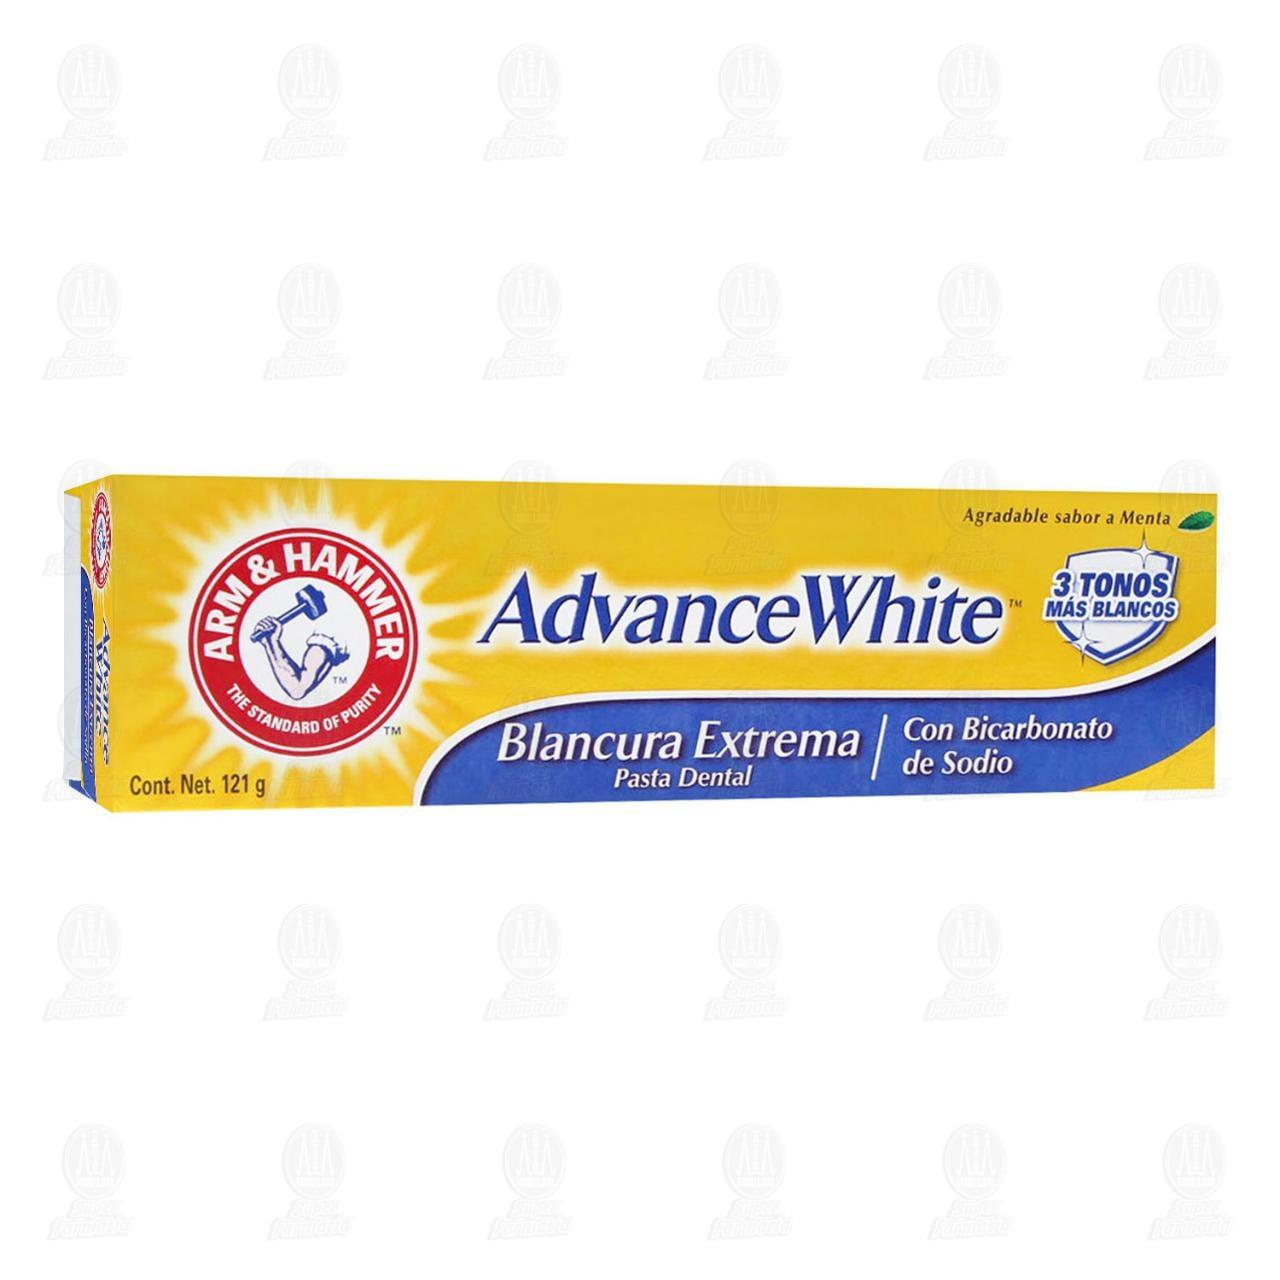 Comprar Arm & Hammer Advance White Pasta Dental Blancura Extrema, 121 gr. en Farmacias Guadalajara